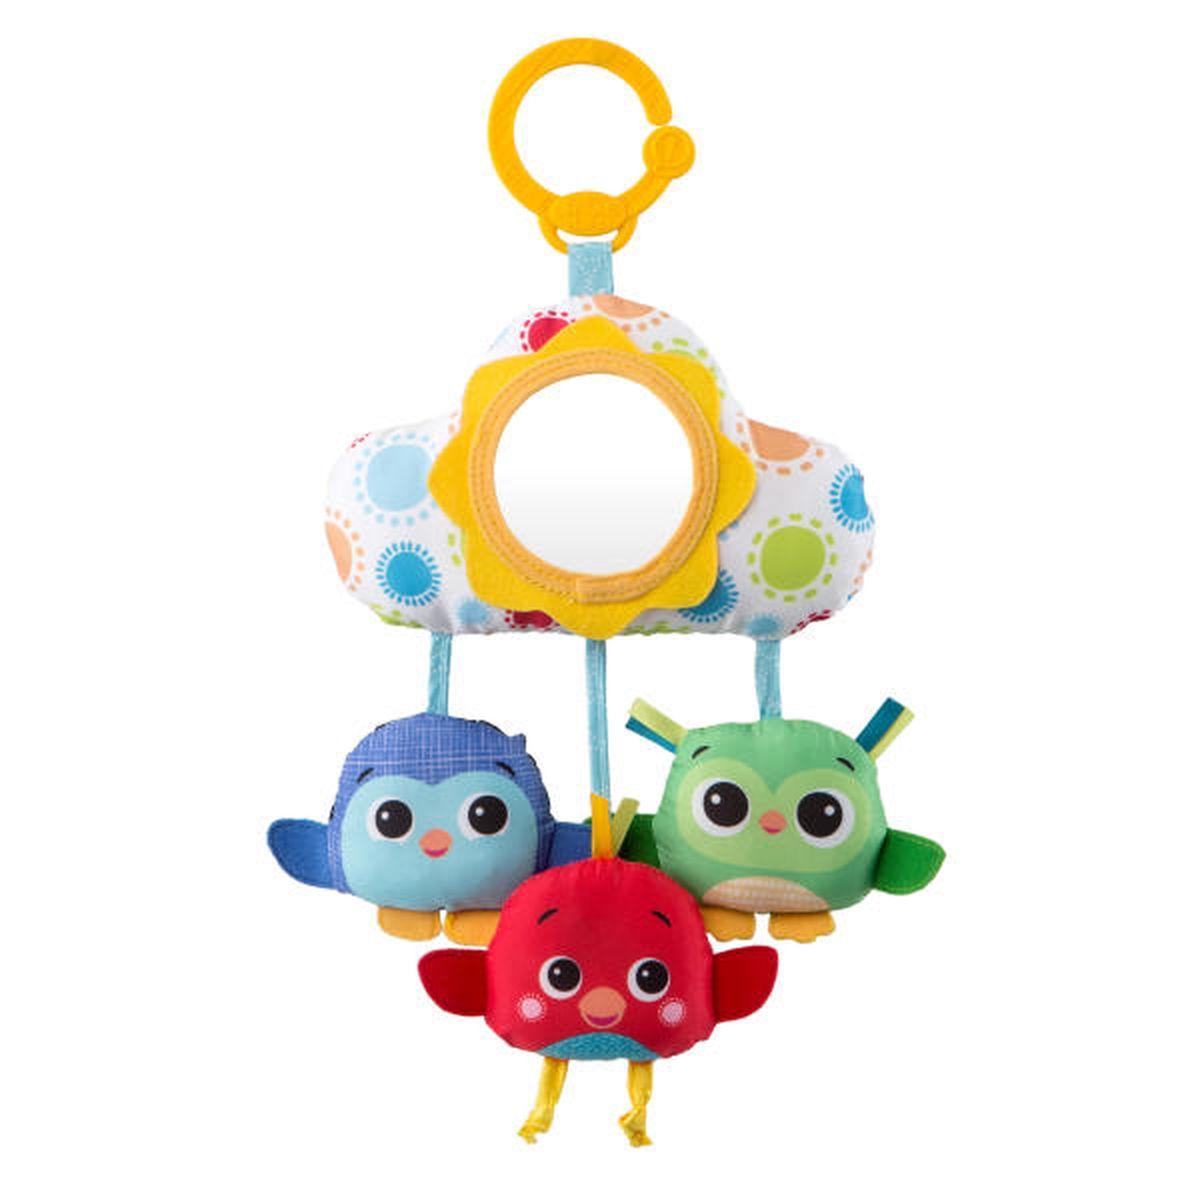 Bright Starts Развивающая игрушка Птички в облачке